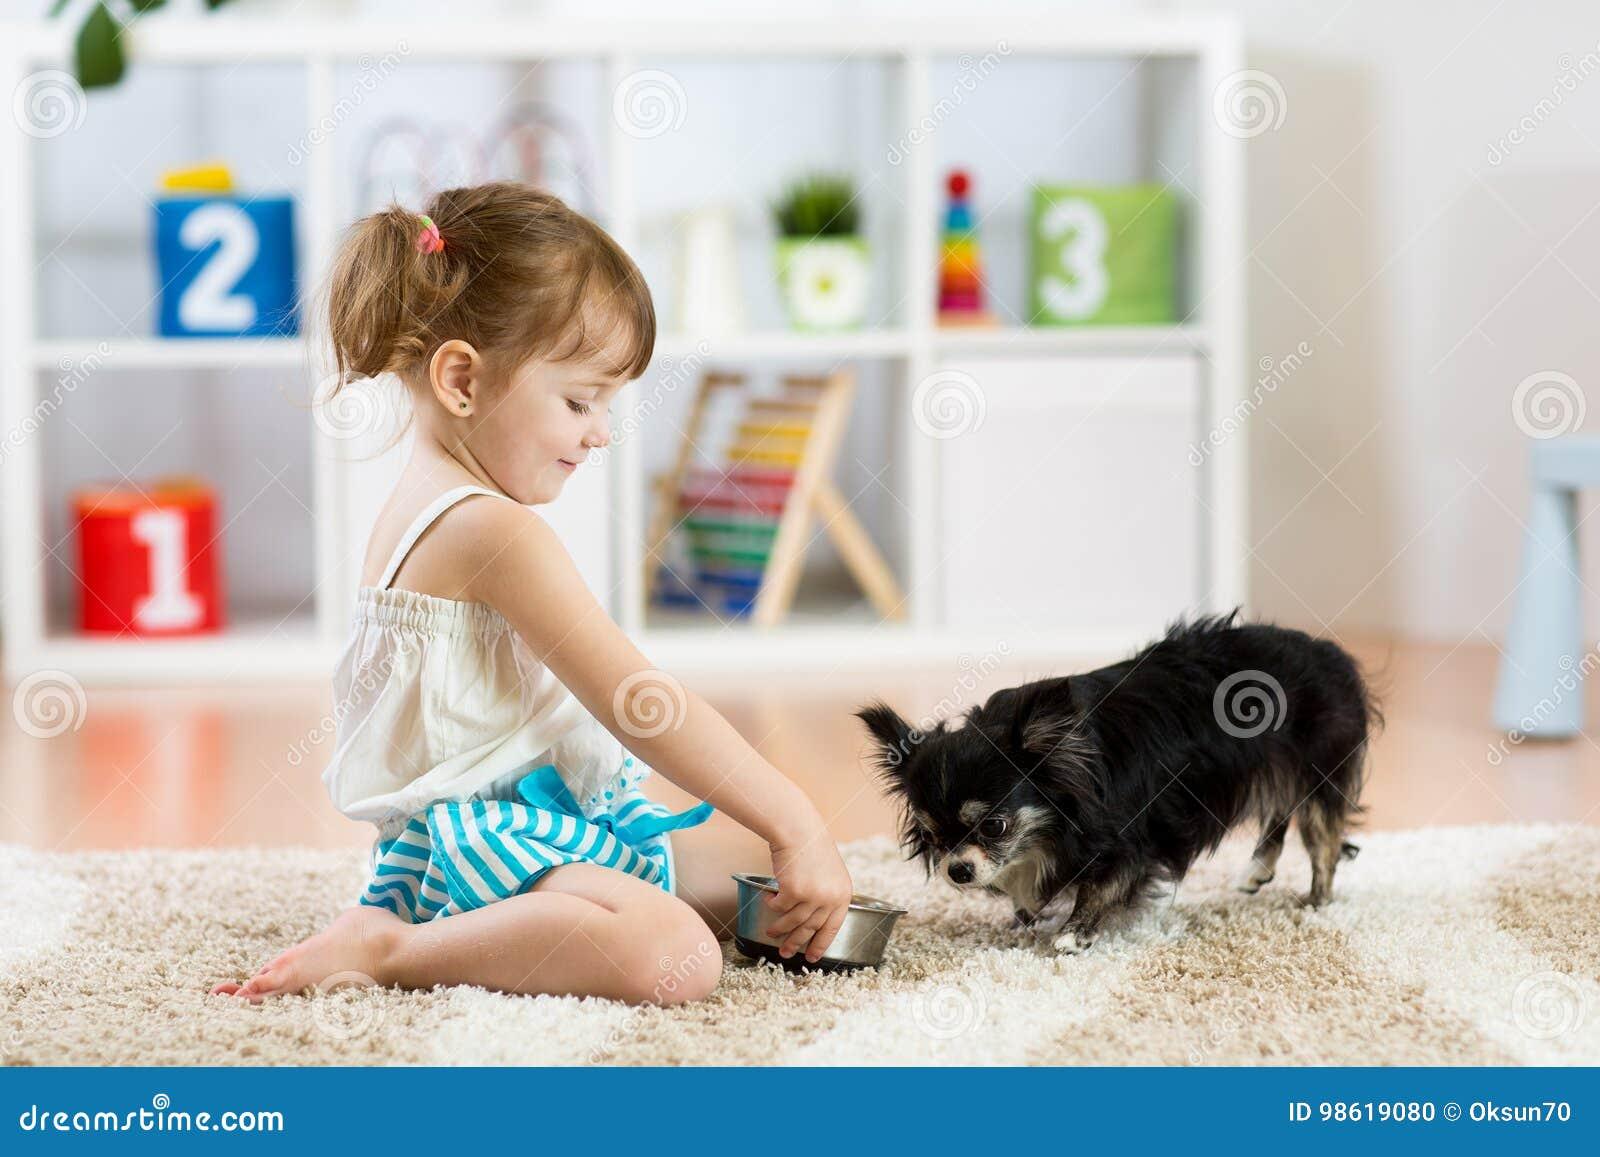 Lilla flickan matar Chihuahuahunden i barnrum Ungar daltar kamratskap